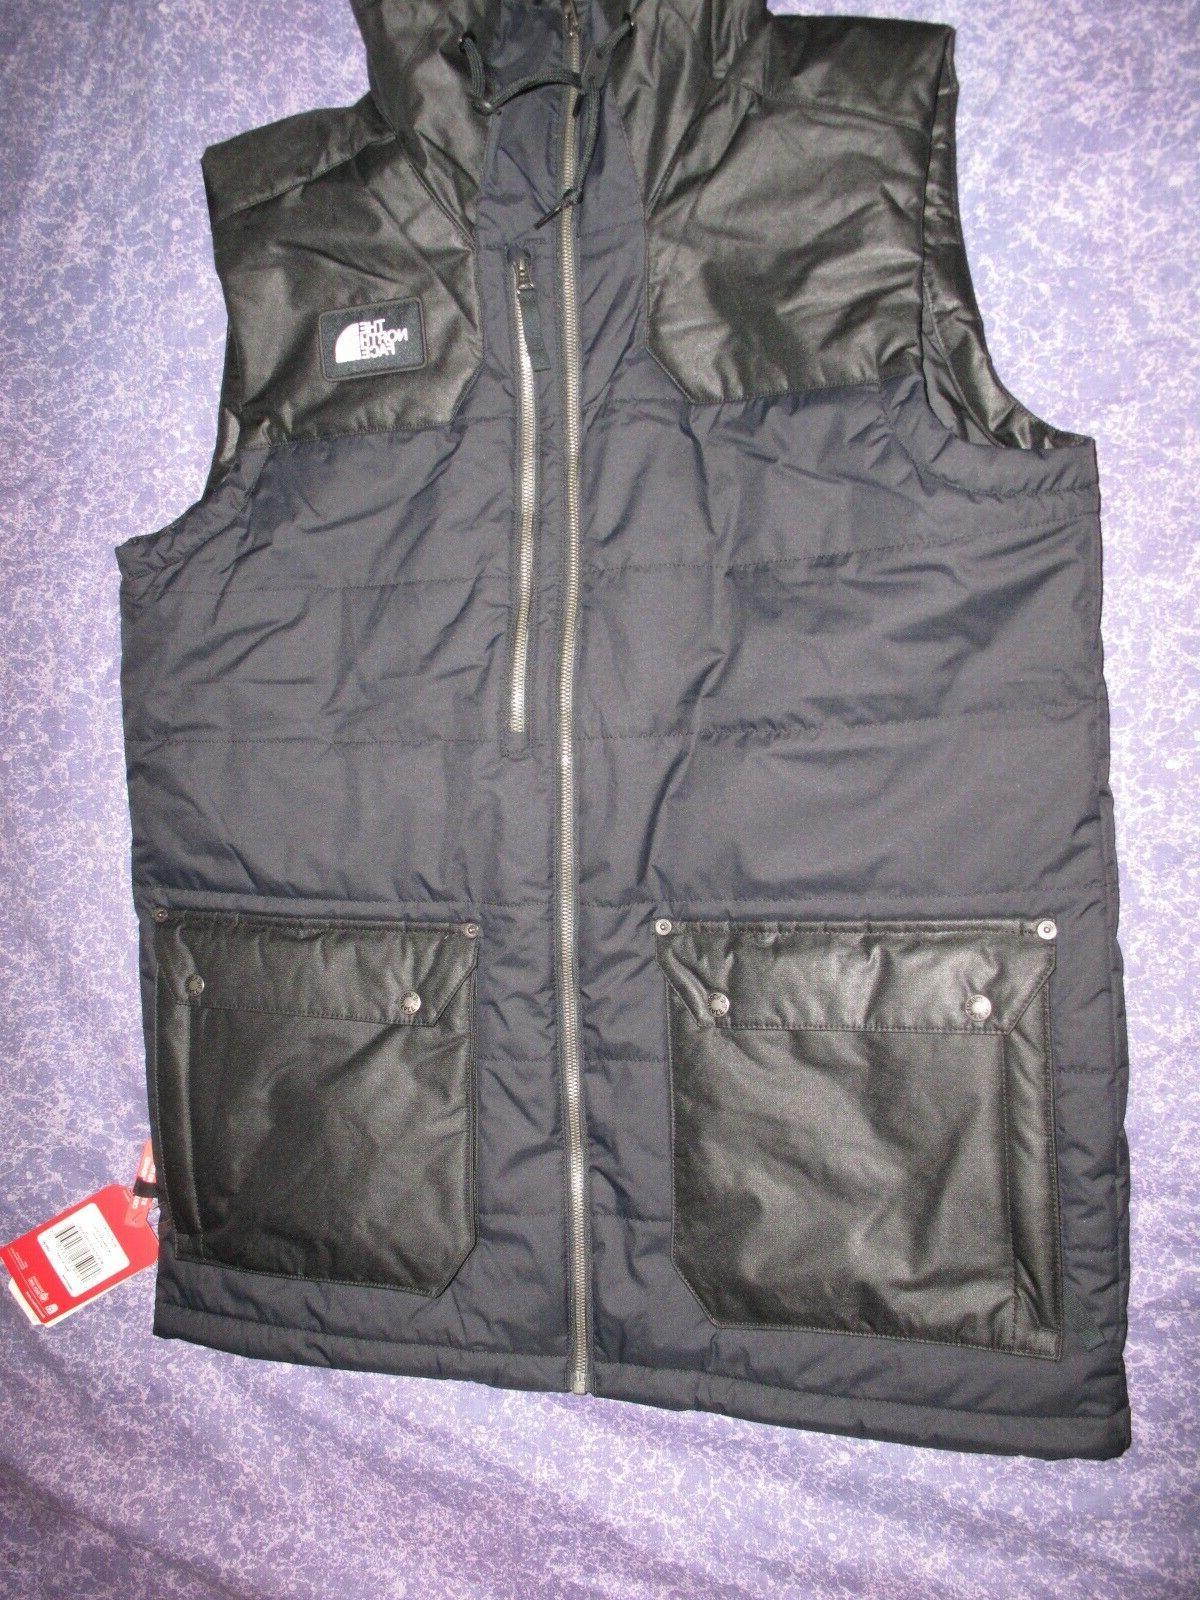 New Face Black Men's Size Large Vest Jacket